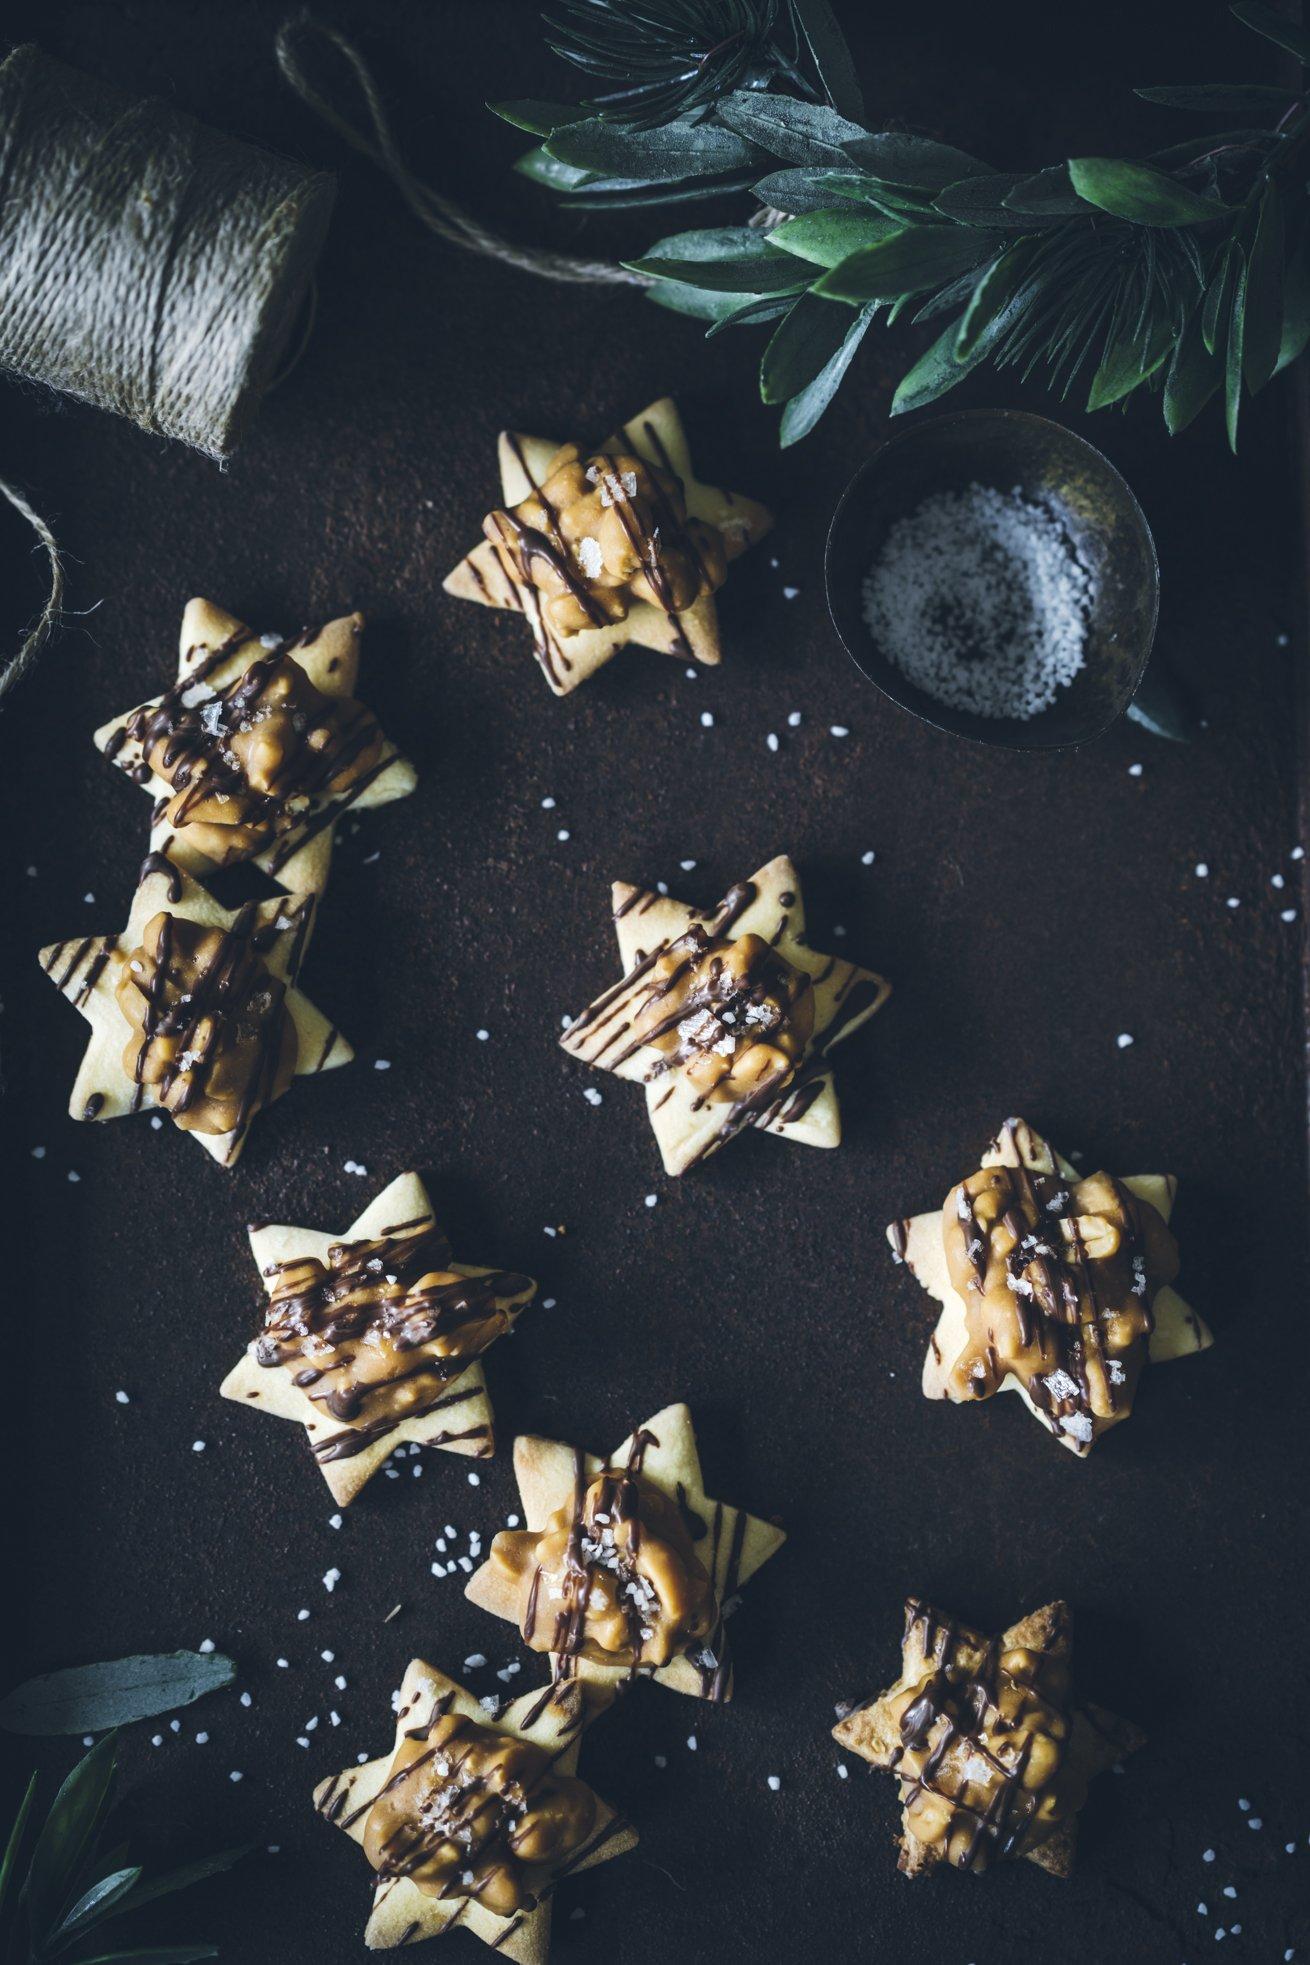 Keks Rezept für tolle Erdnuss Karamell Sterne